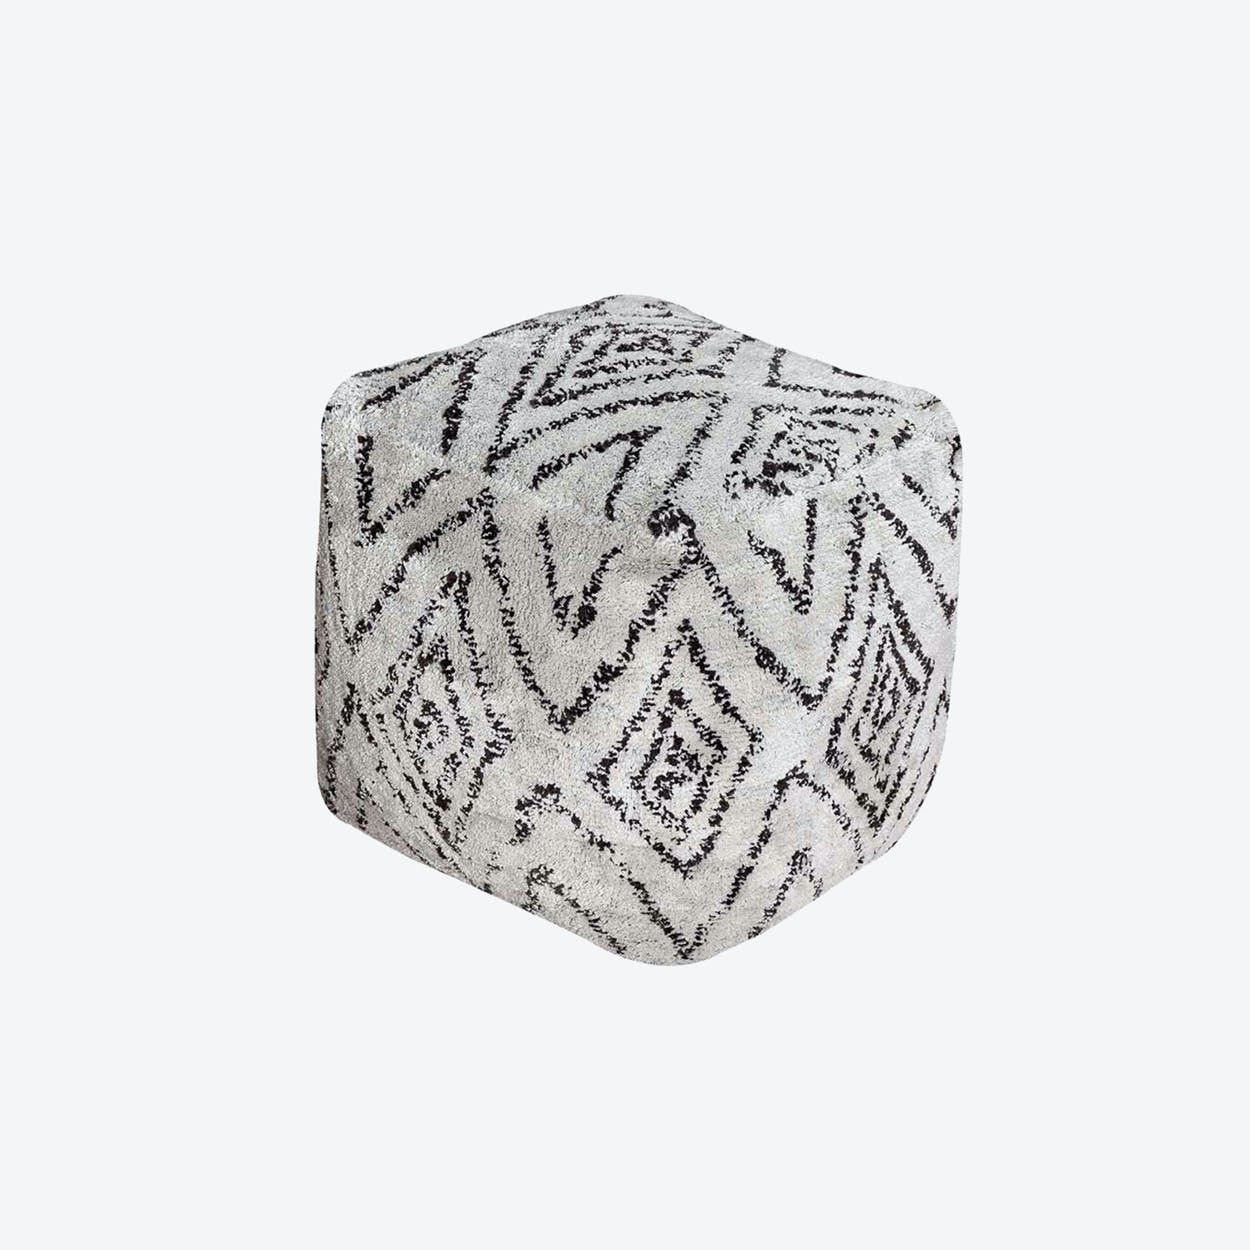 NOAH Pouf in Grey/Charcoal (40x40x40)